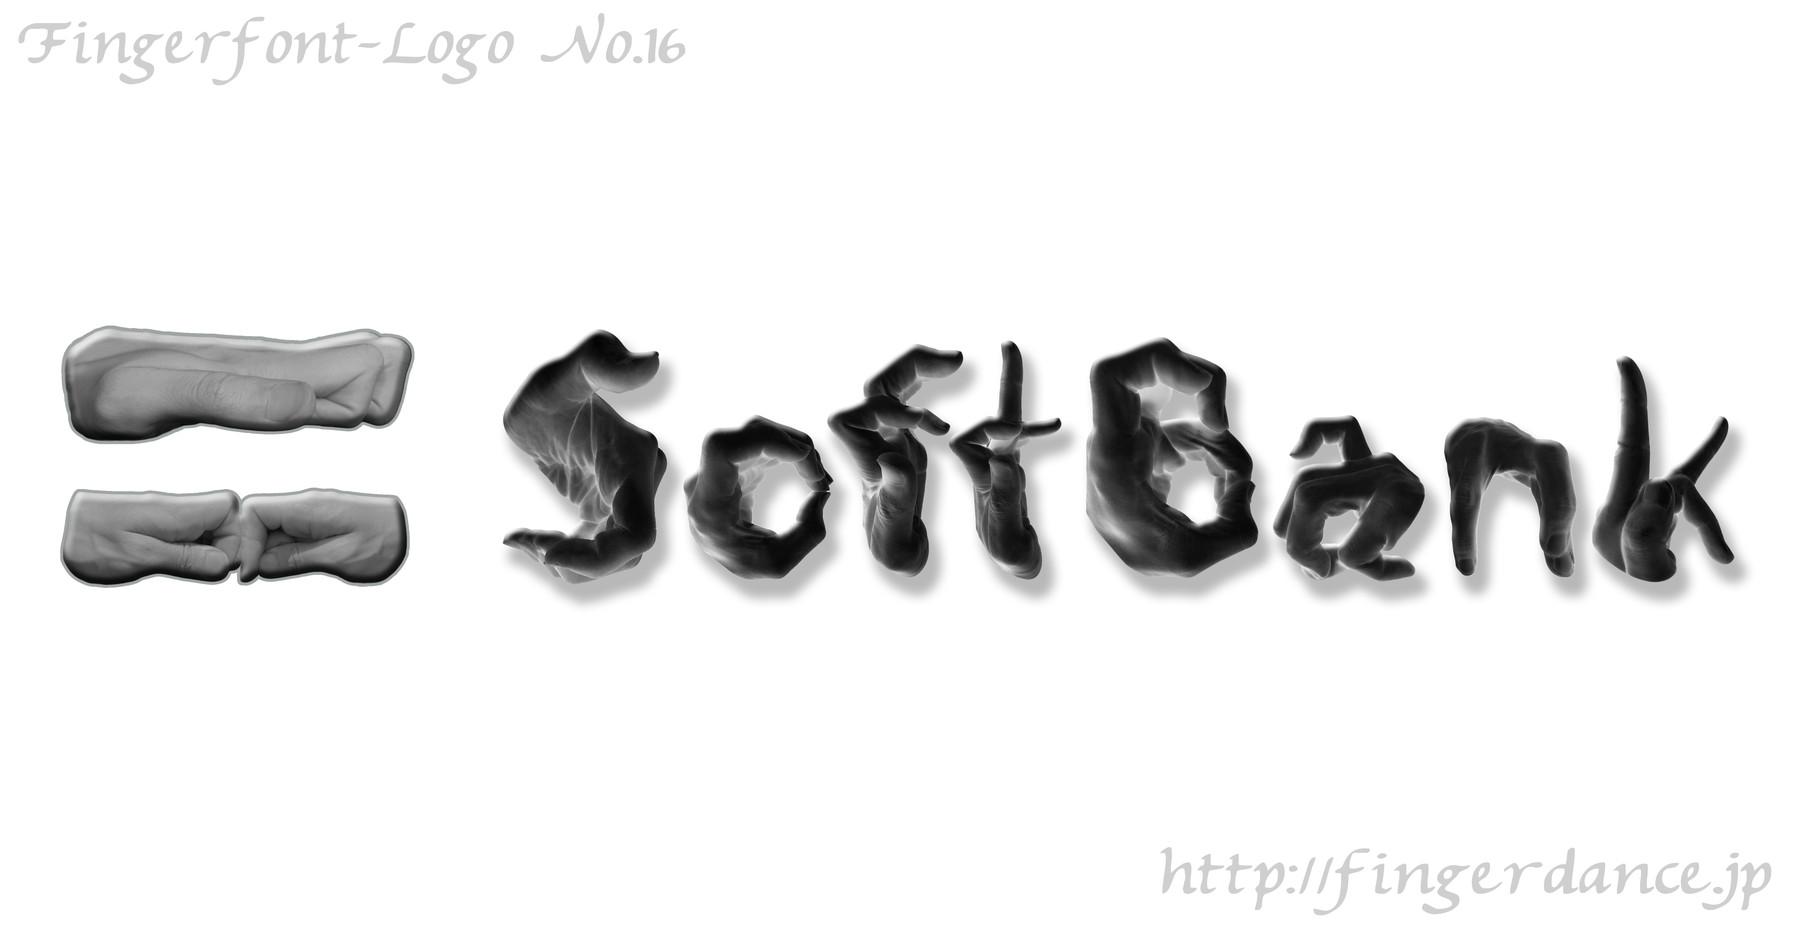 SoftBank-fingerlogohand ソフトバンクフィンガーロゴハンド手指